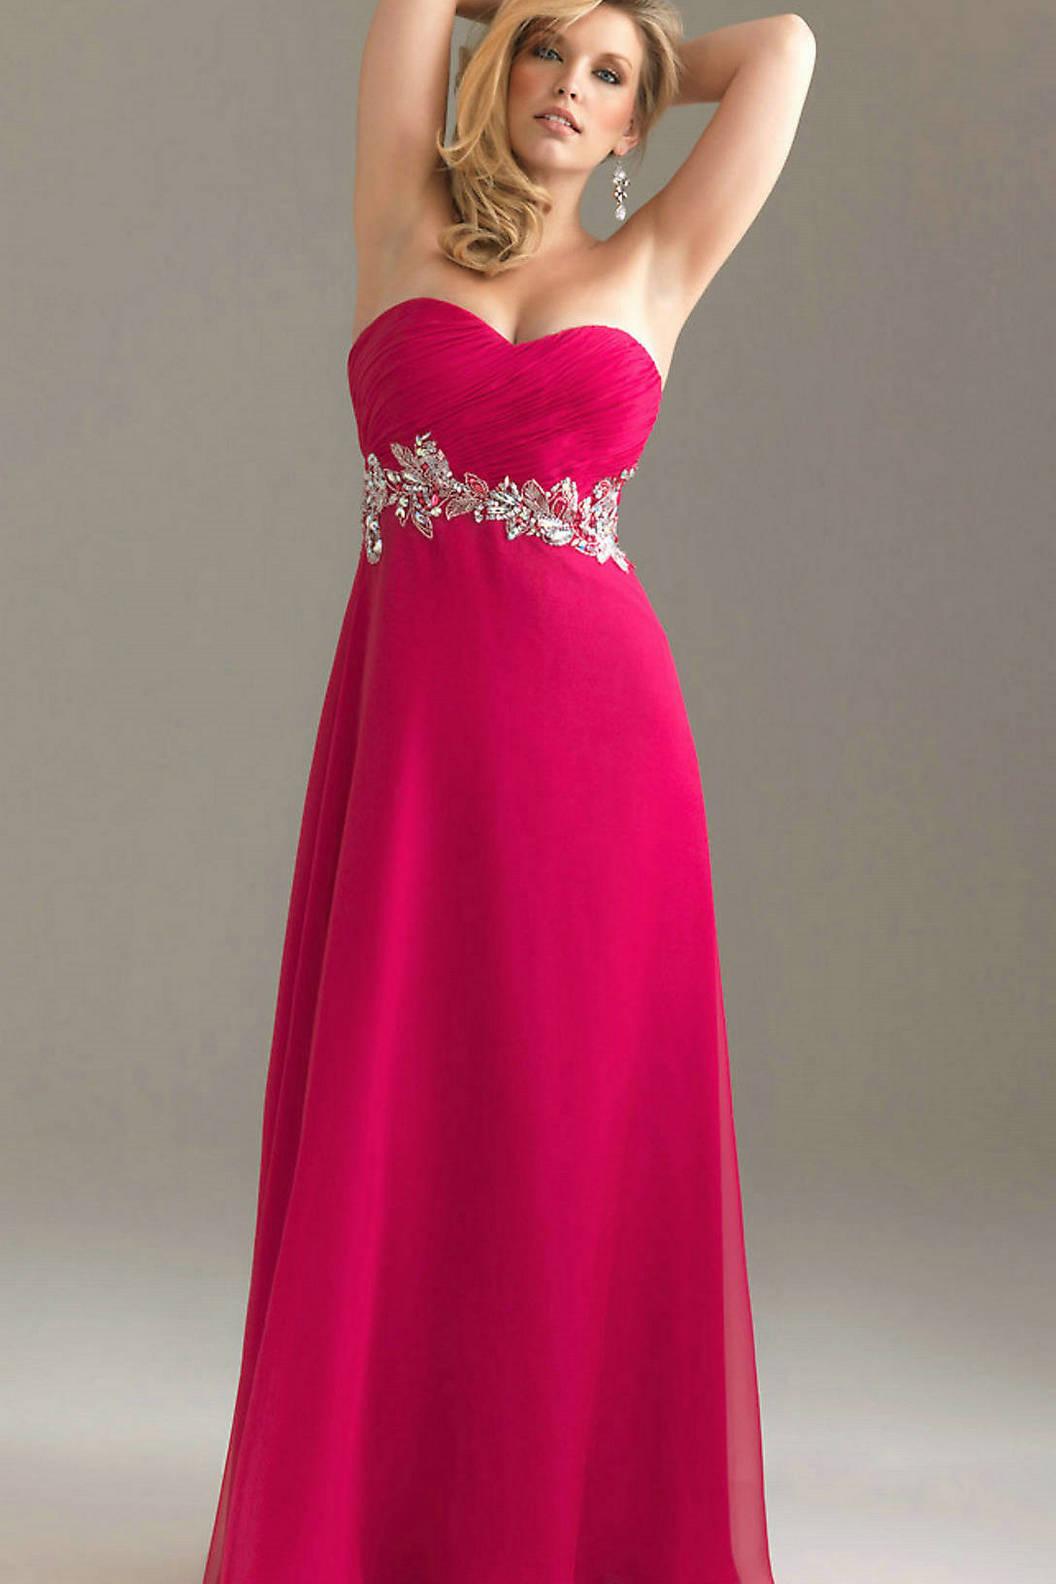 Plus Size Prom Dresses 2015 Dillards - Gomes Weine AG